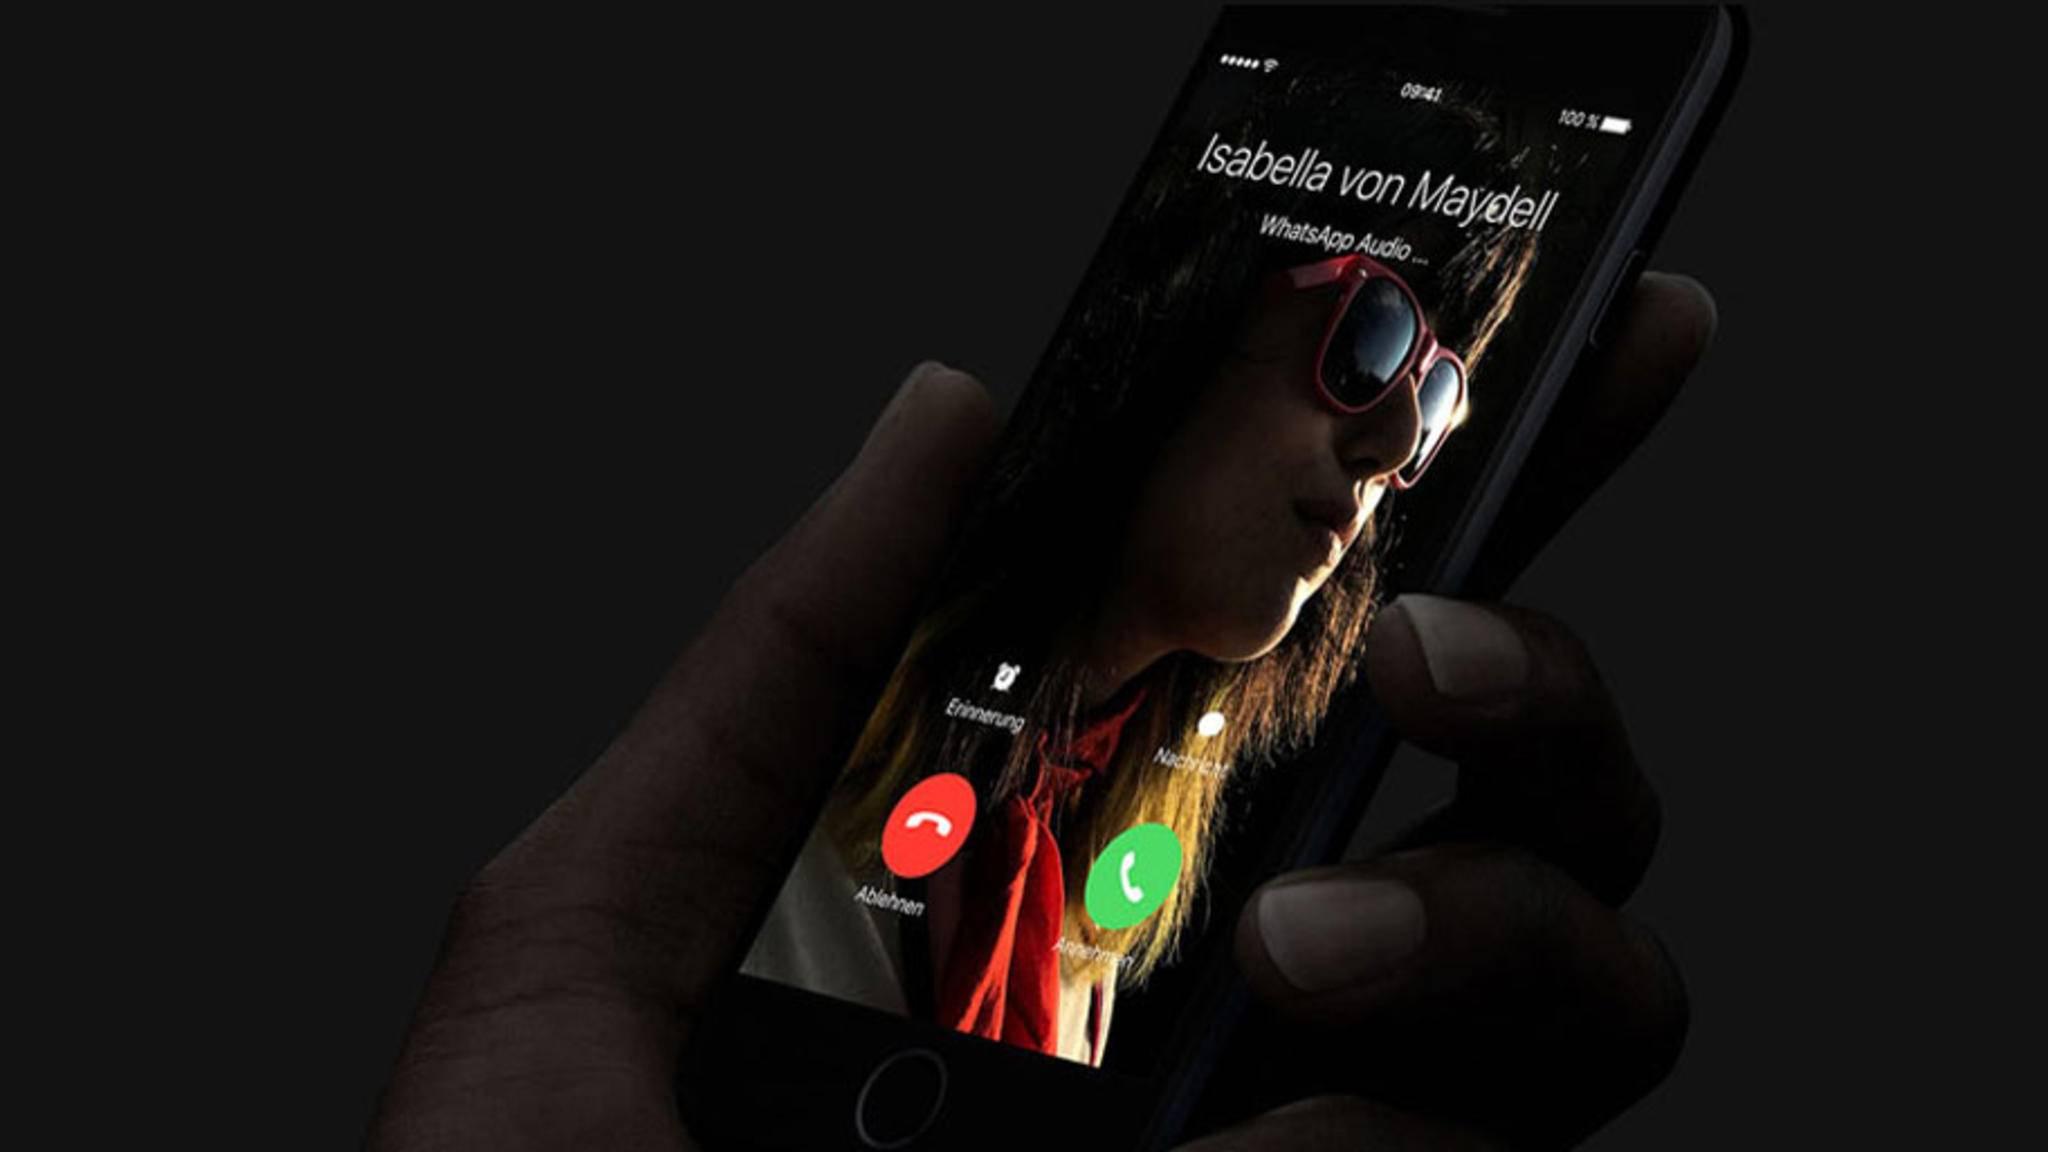 iPhone WLAN-Anruf